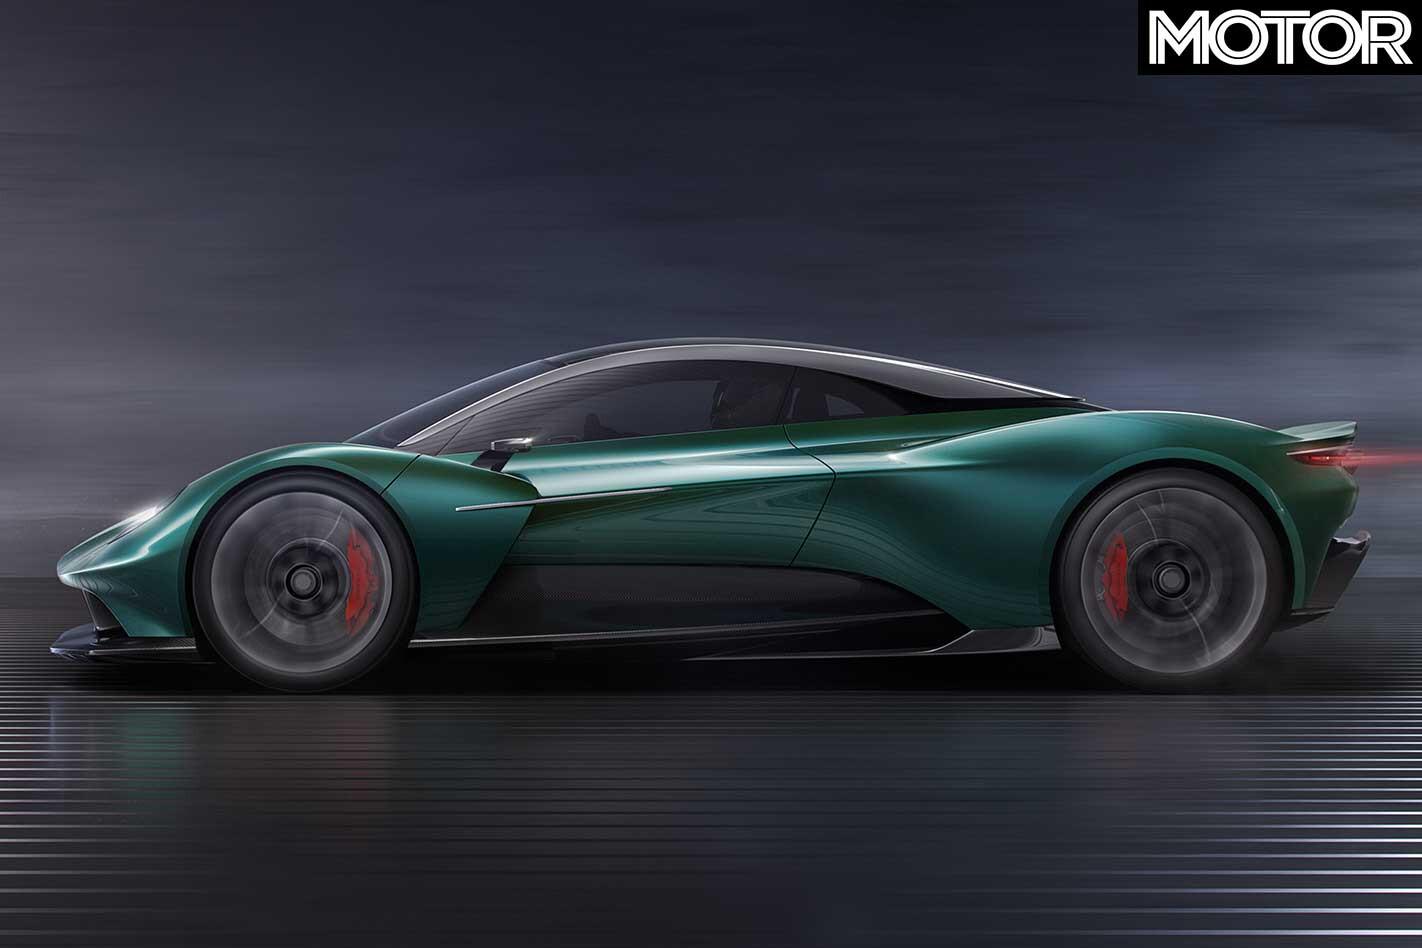 Aston Martin Vanquish Side Profile Jpg